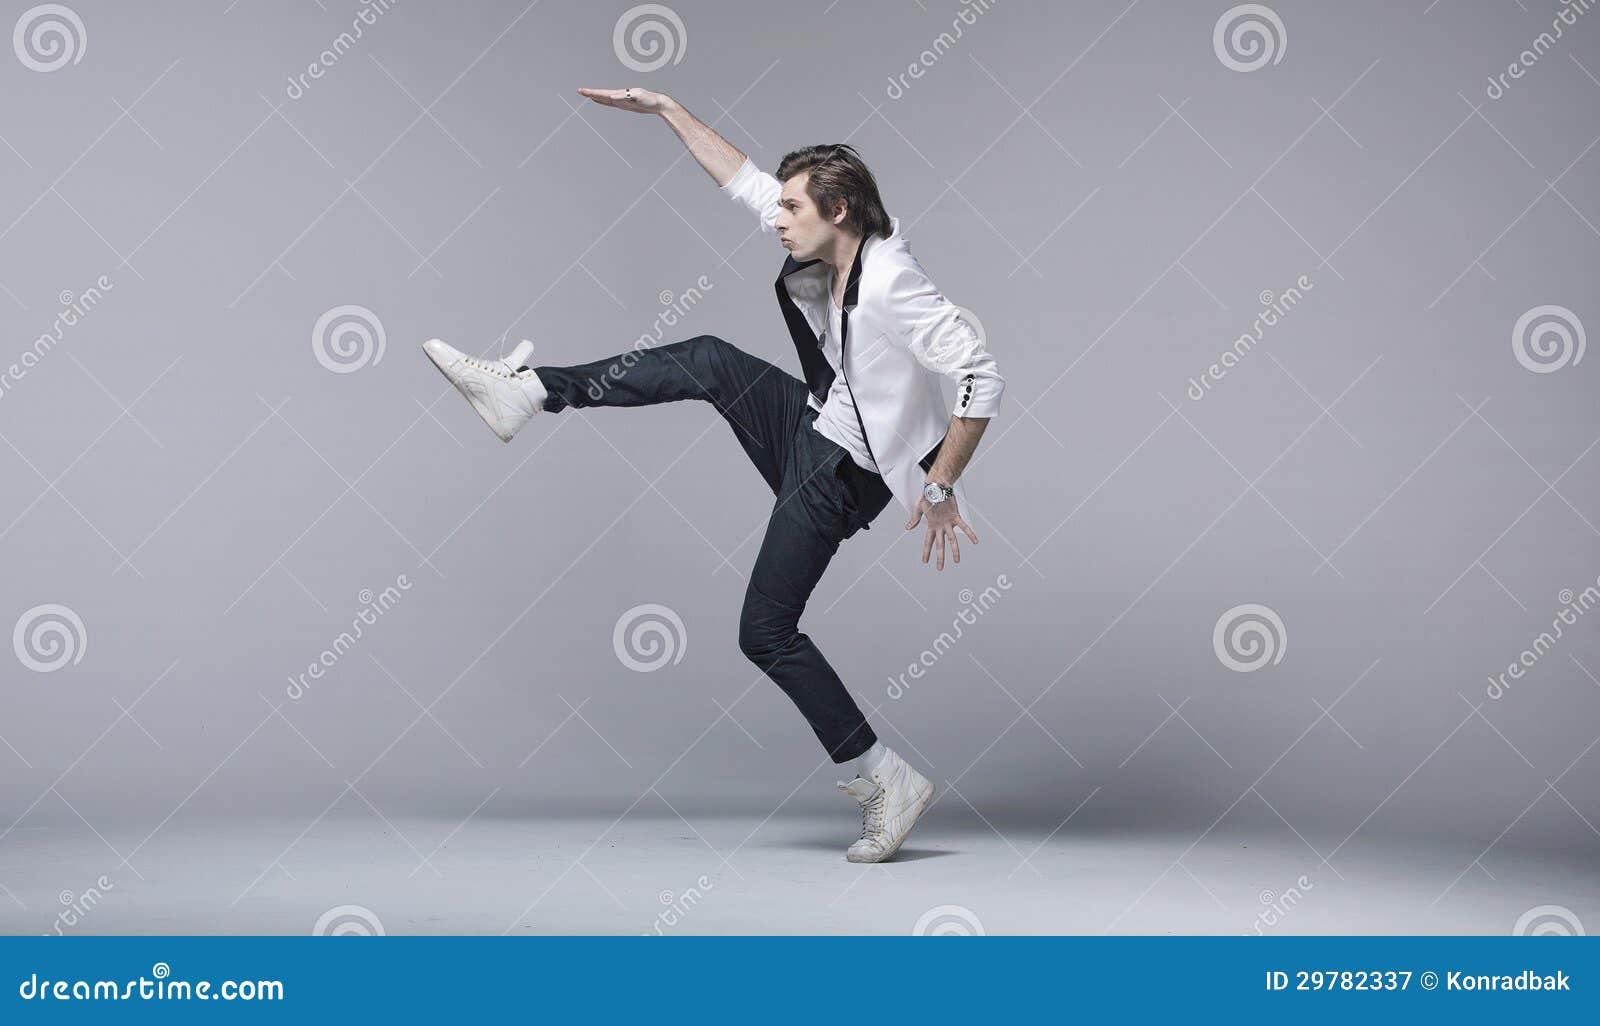 Acrobating